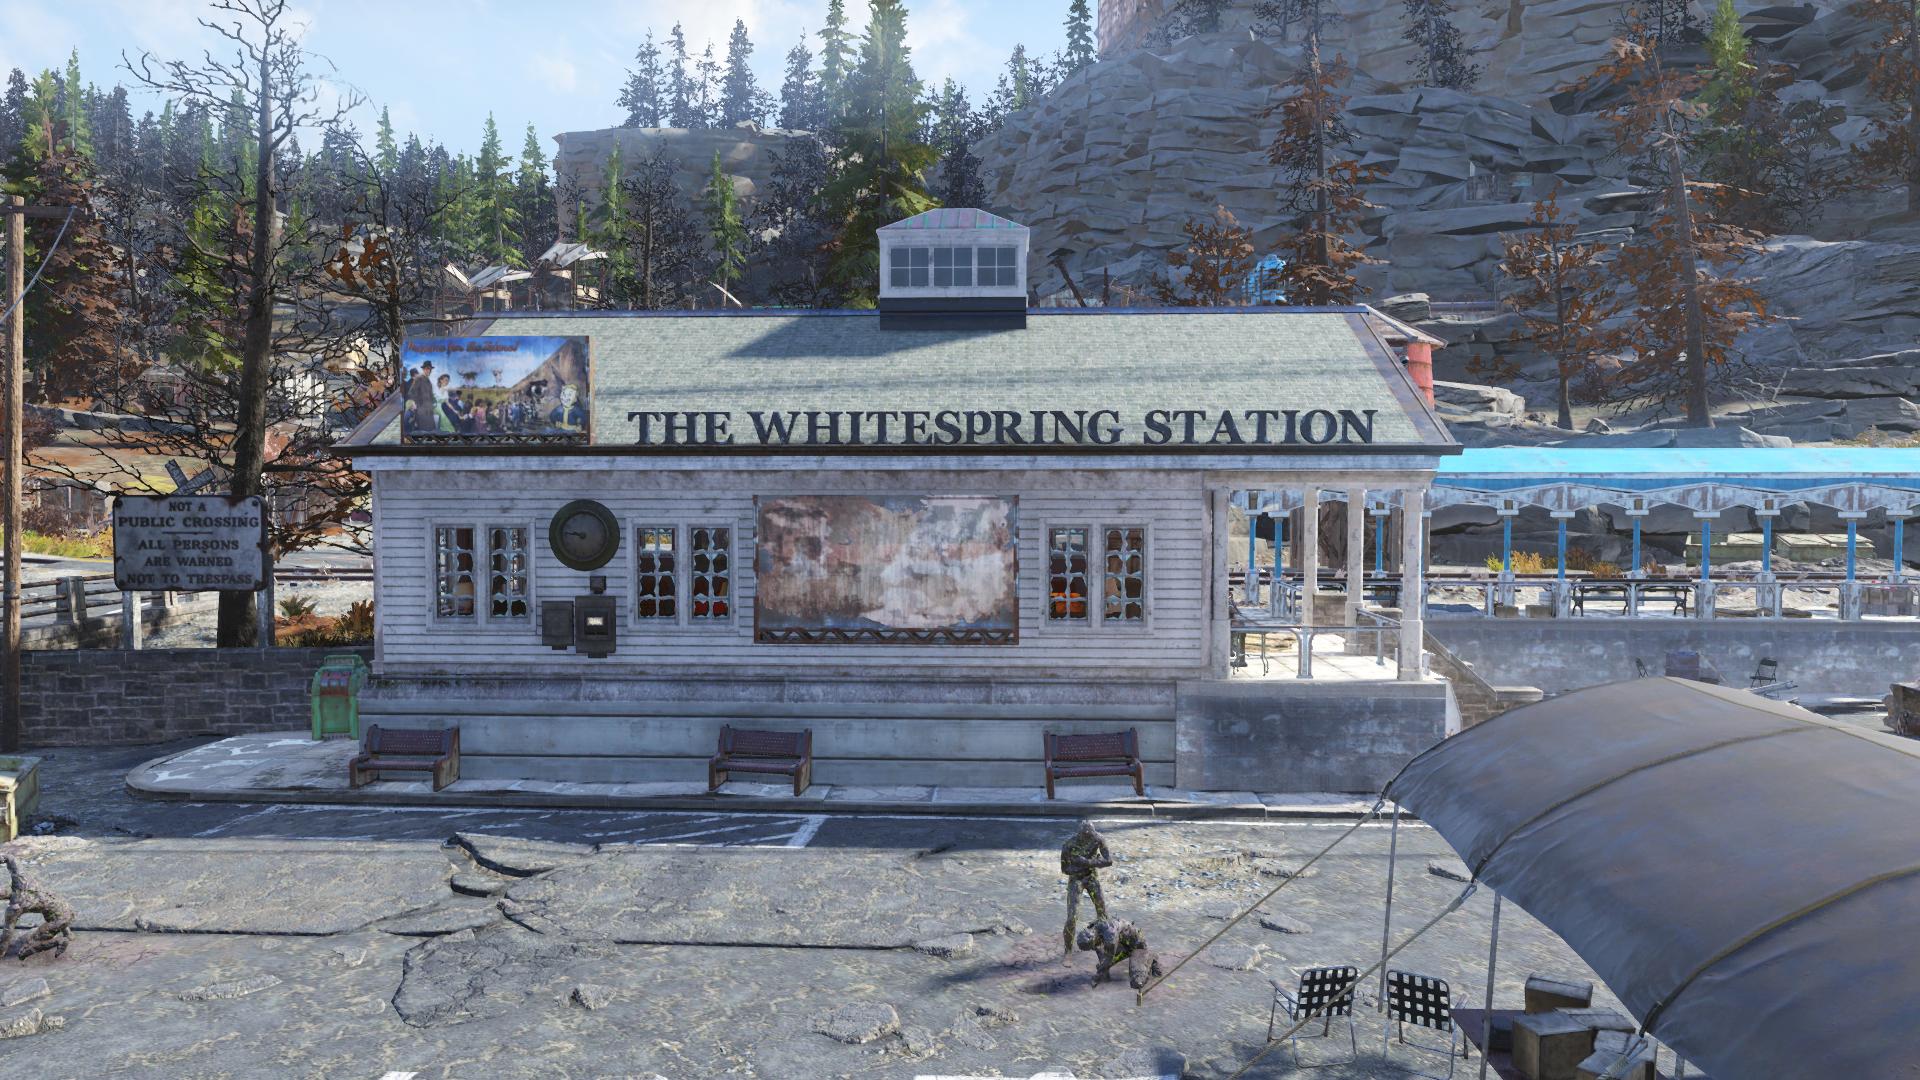 The Whitespring station